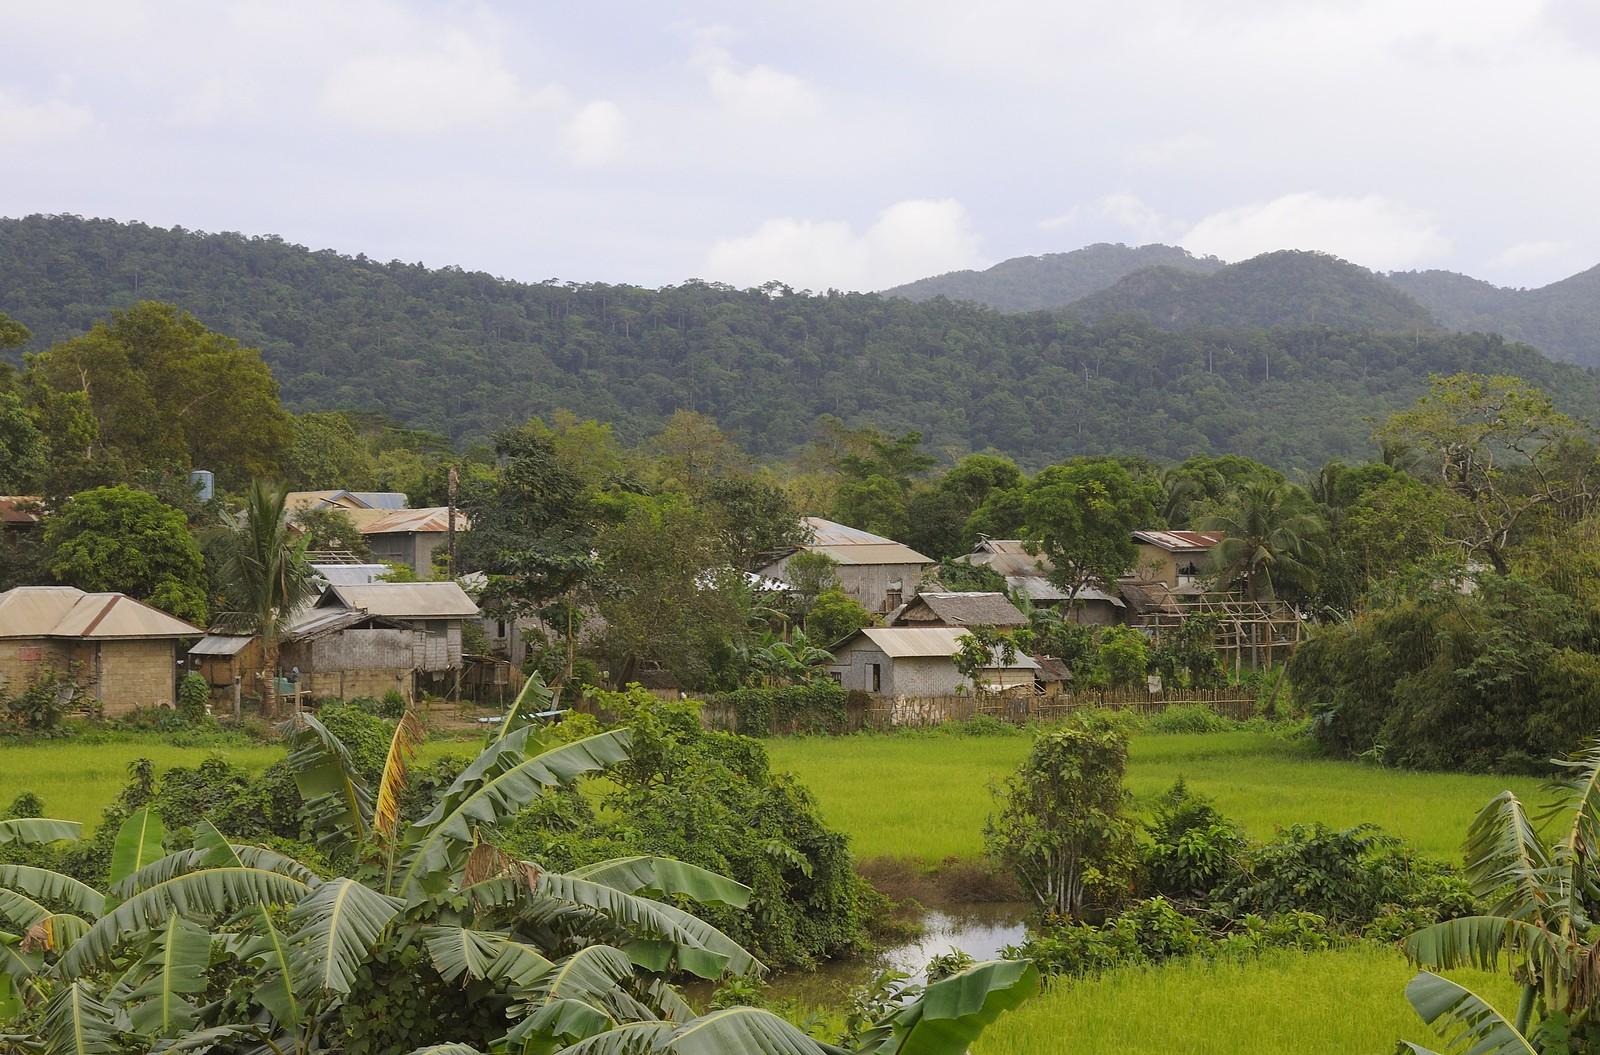 PALAWAN: El Nido